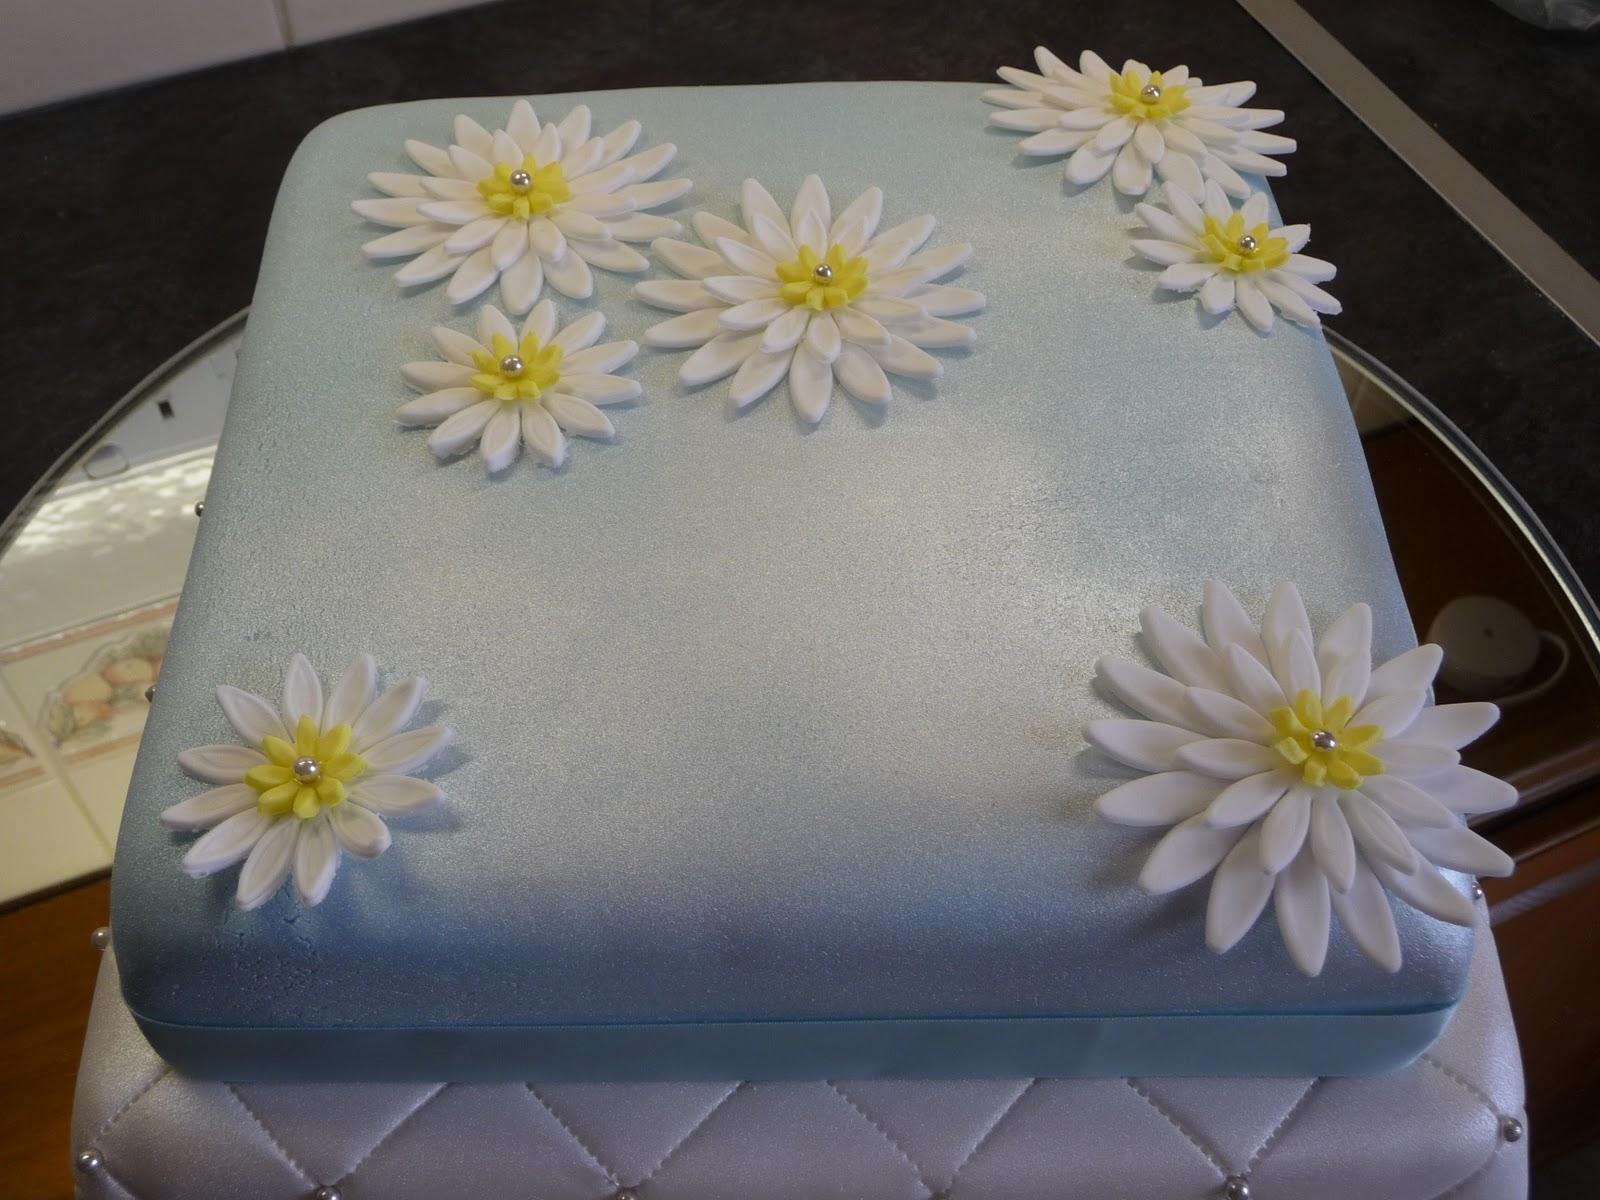 Princess Crafts Flower Power Cake